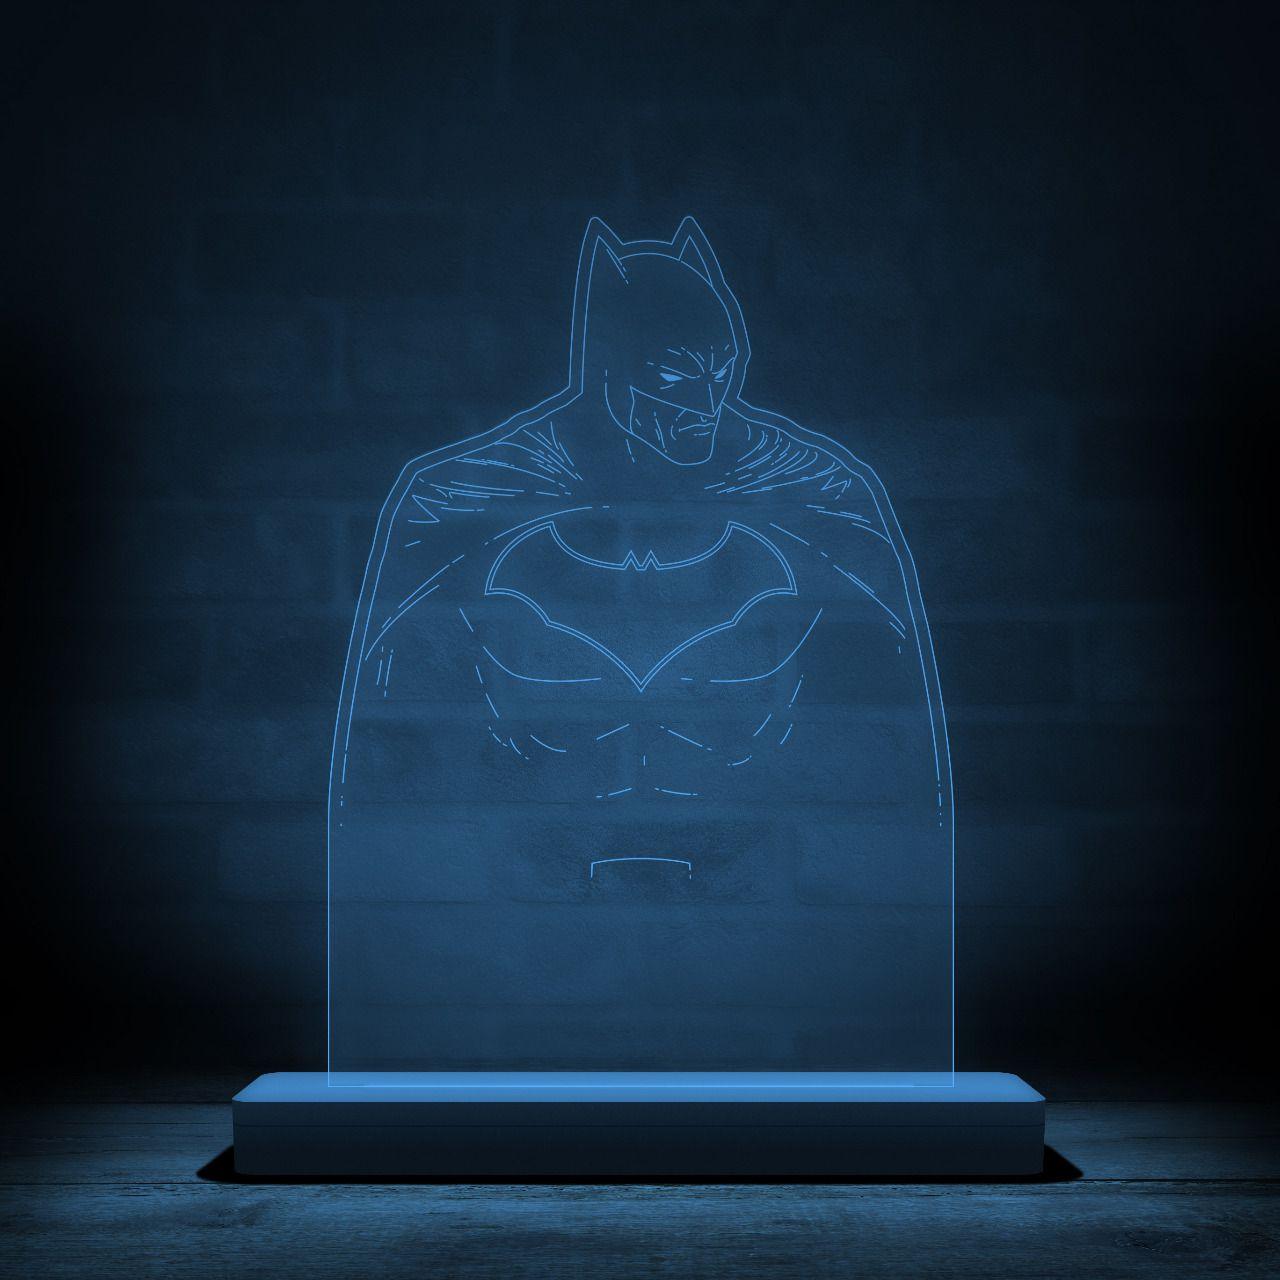 Luminária/Abajur Batman: DC Comics